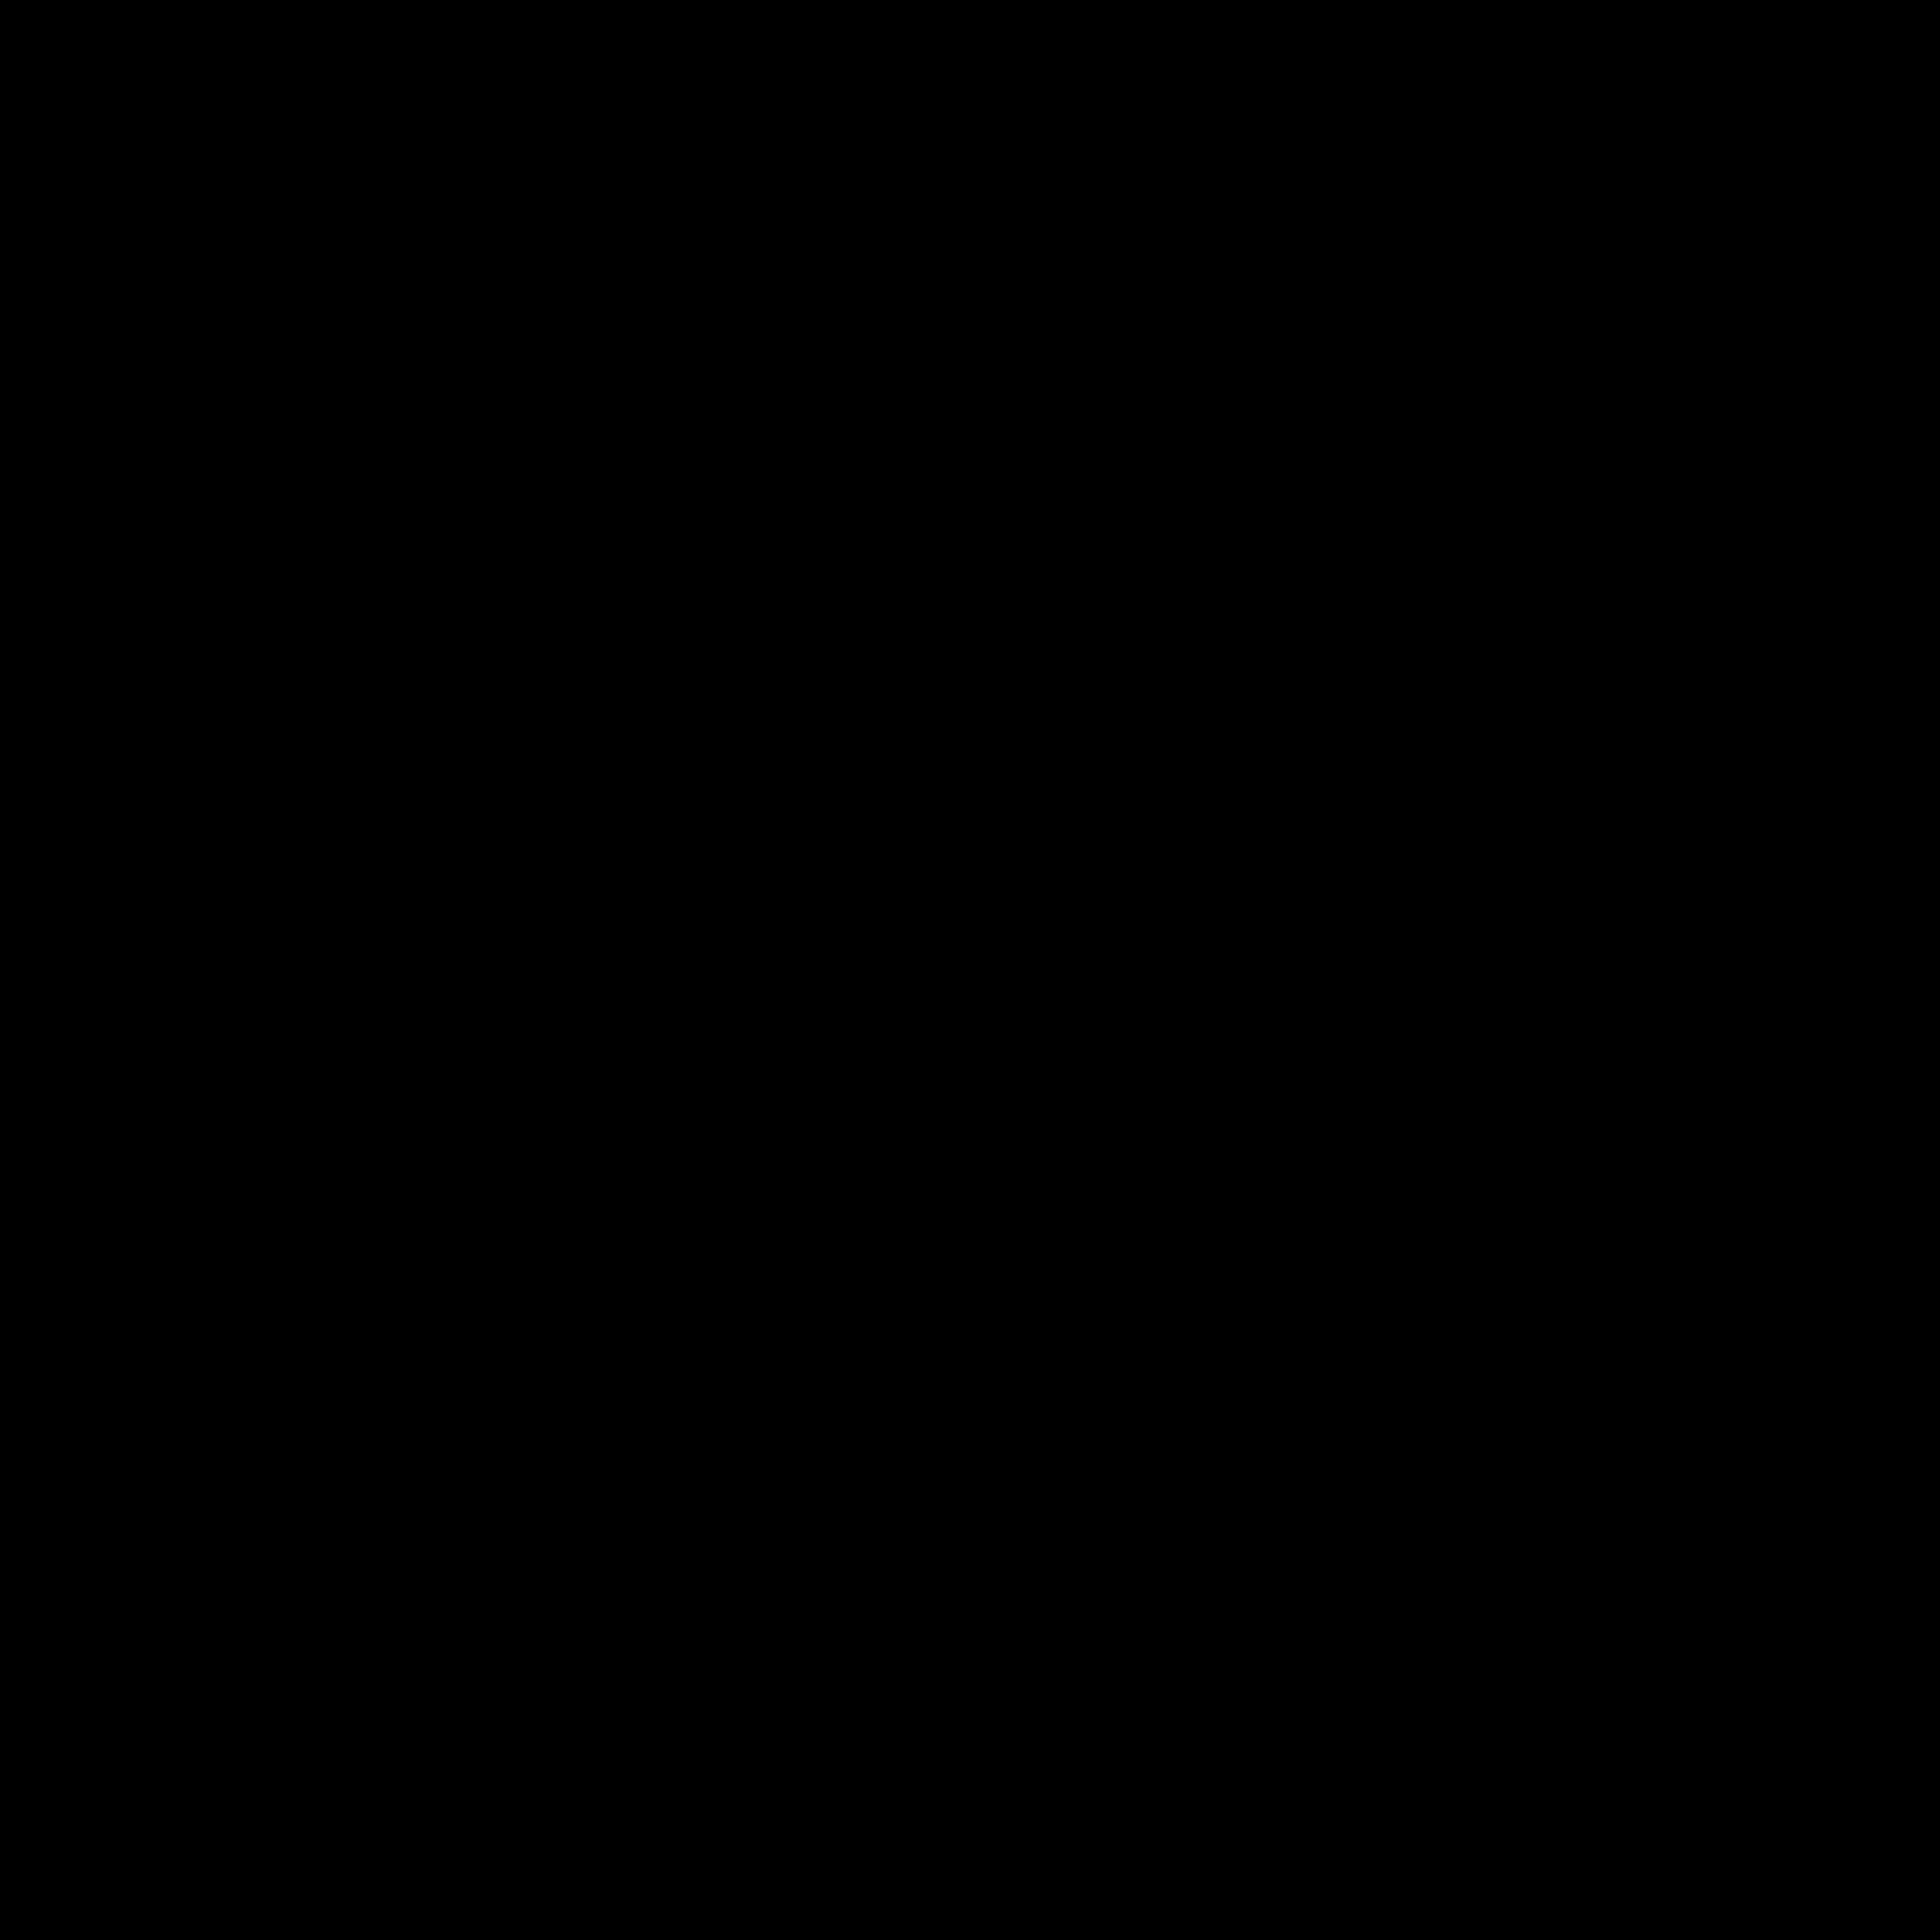 University of Phoenix Logo PNG Transparent & SVG Vector - Freebie Supply